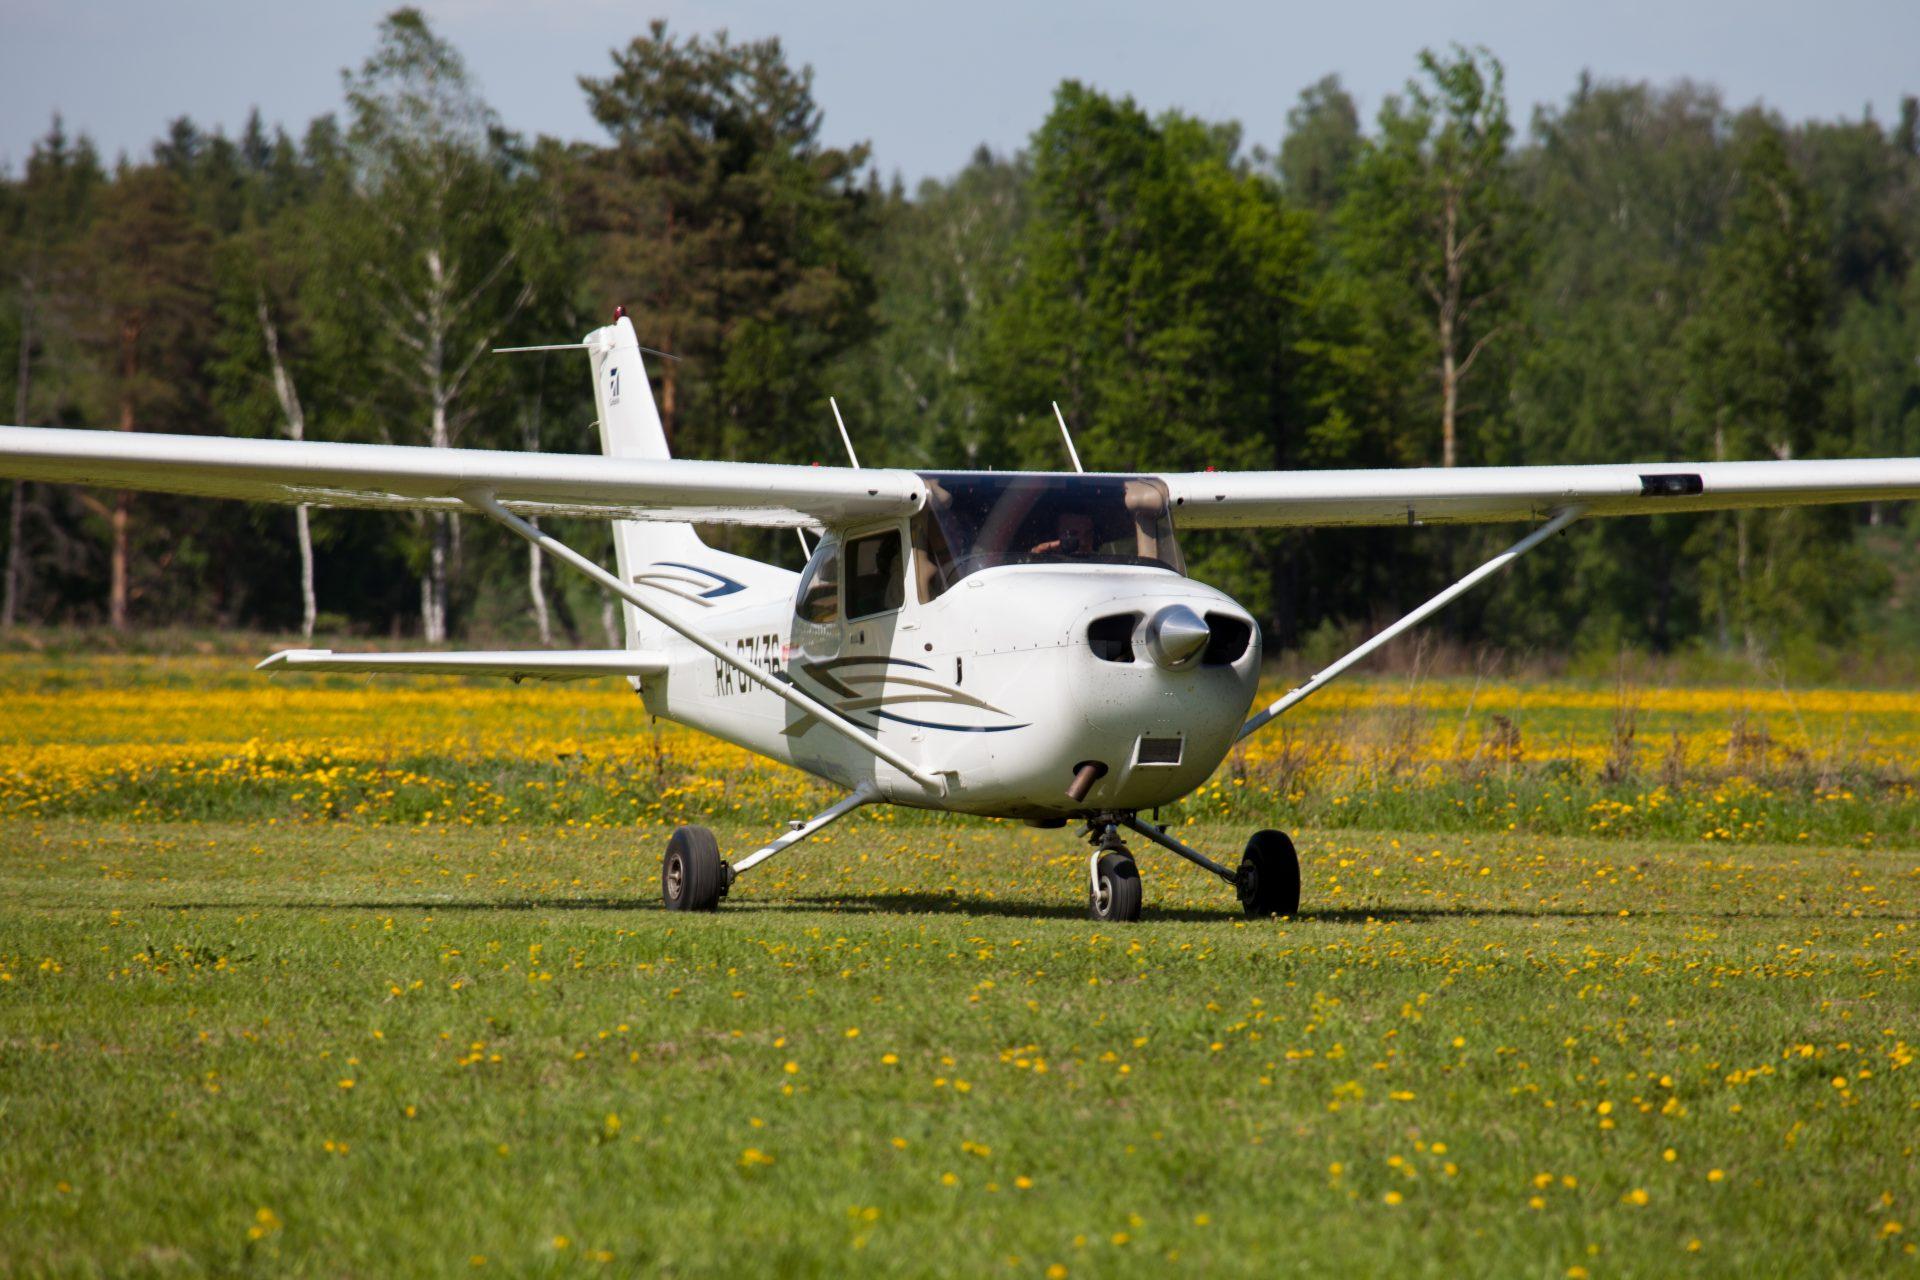 Pilotem na zkoušku z letiště Ostrava - Mošnov - let s letadlem ... 5ed6ec81ec